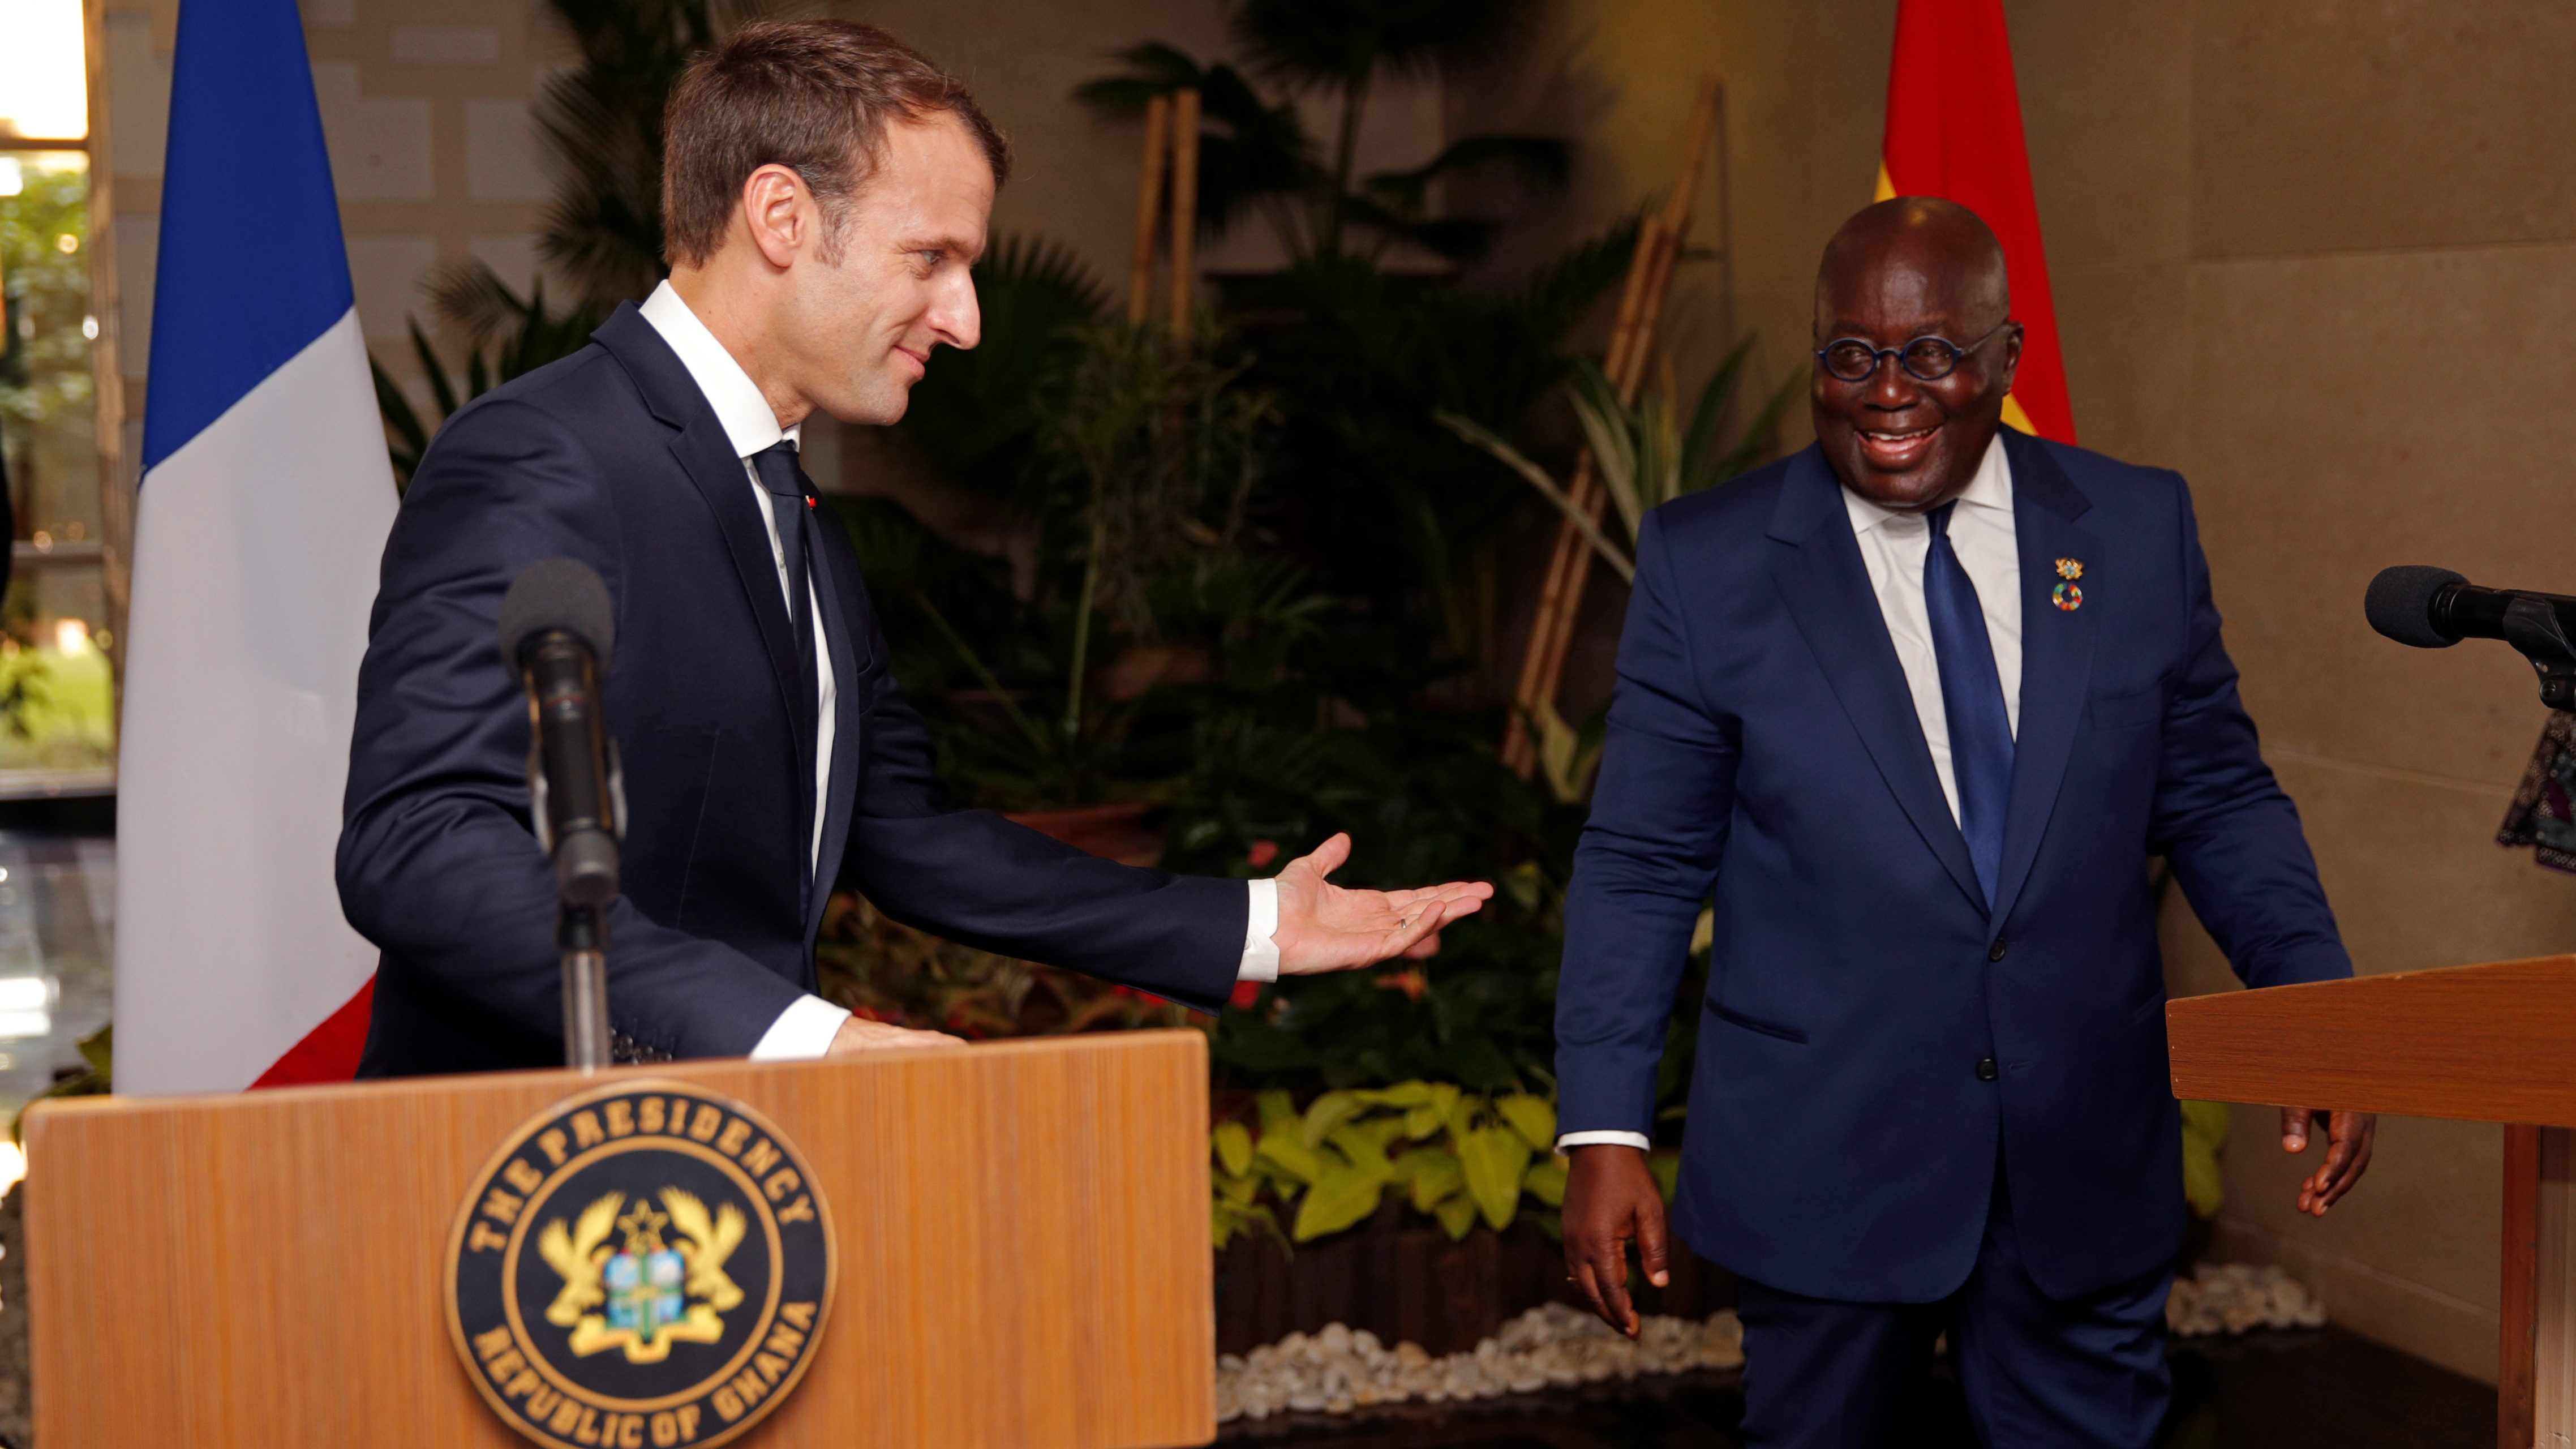 French President Emmanuel Macron speaks with Ghana's President Nana Akufo-Addo in Accra